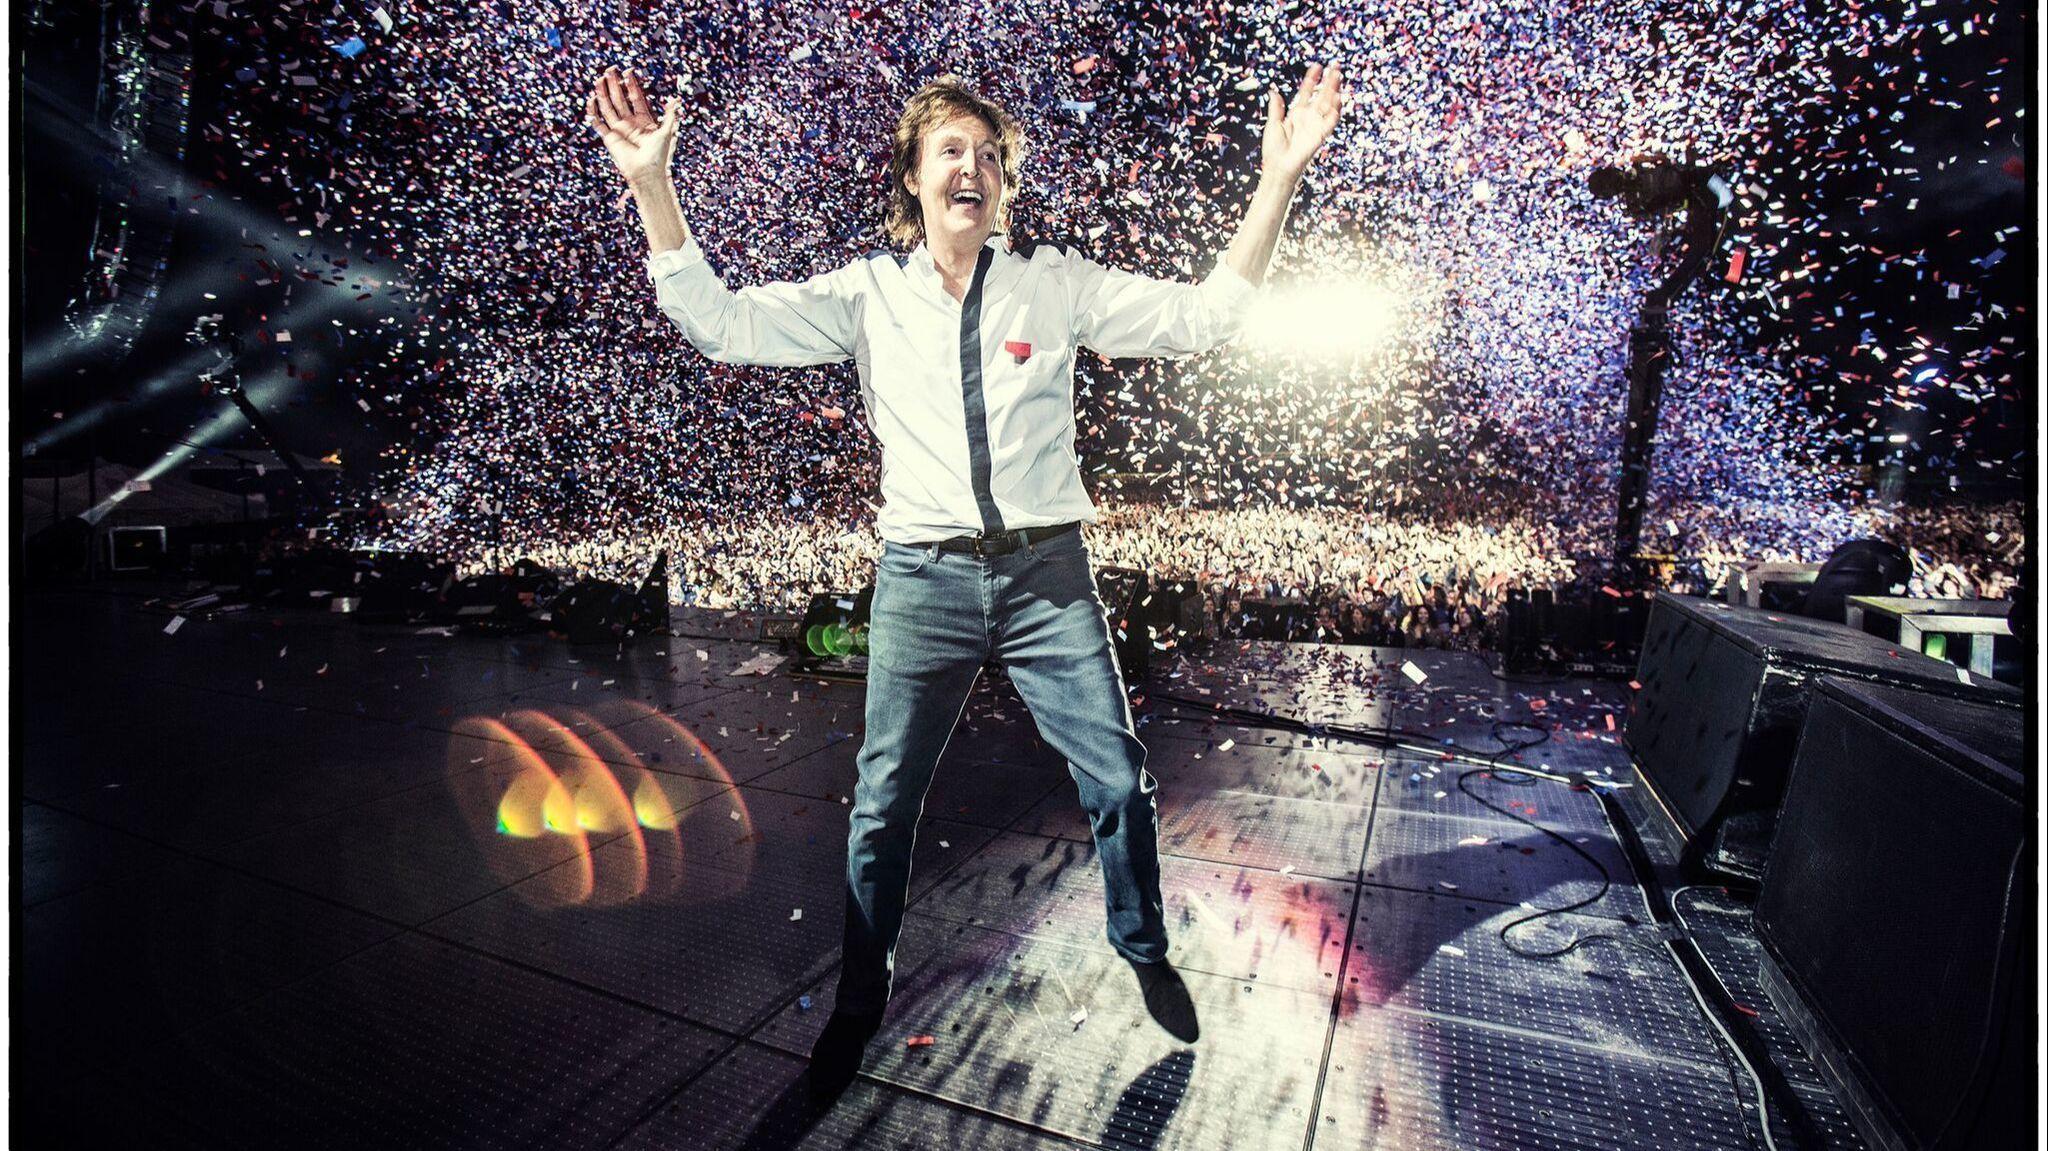 Paul McCartney announces new stadium shows in San Diego, Los Angeles, Green Bay and Arlington, Texas